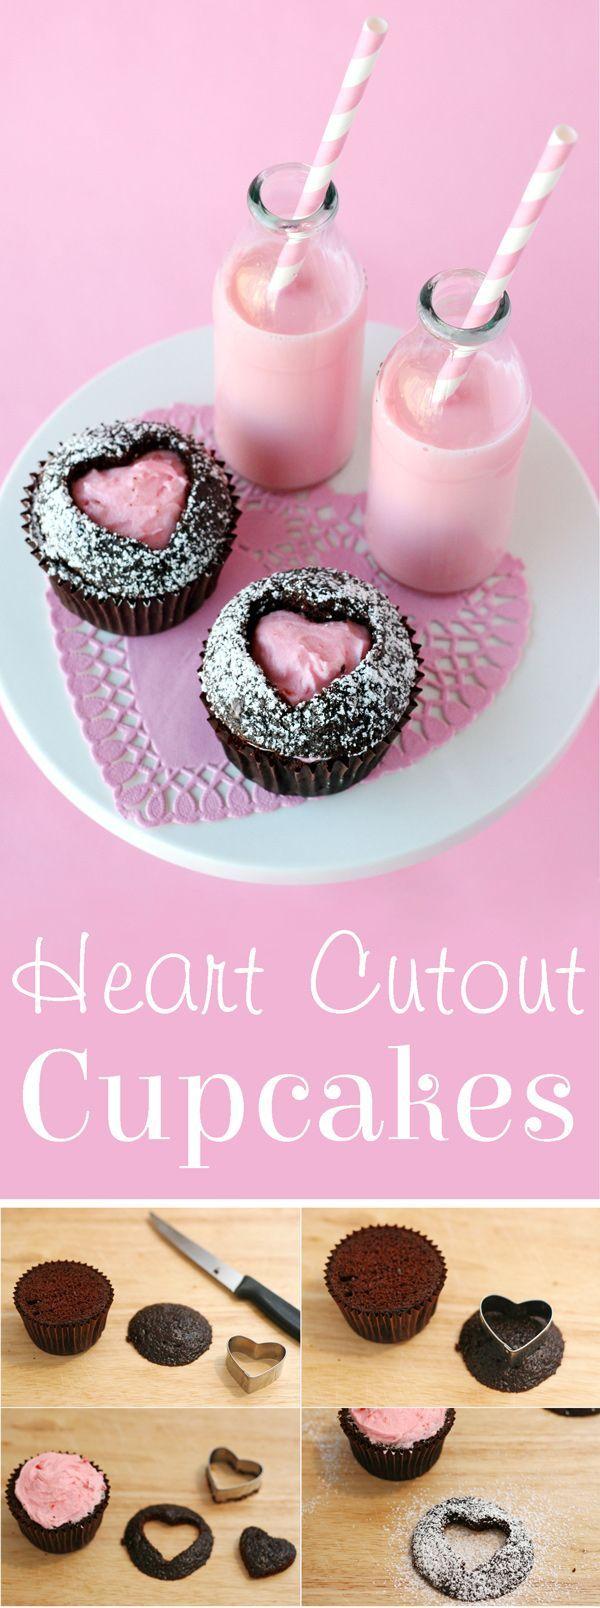 Adorable and creative Heart Cutout Cupcakes! via http://GloriousTreats.com